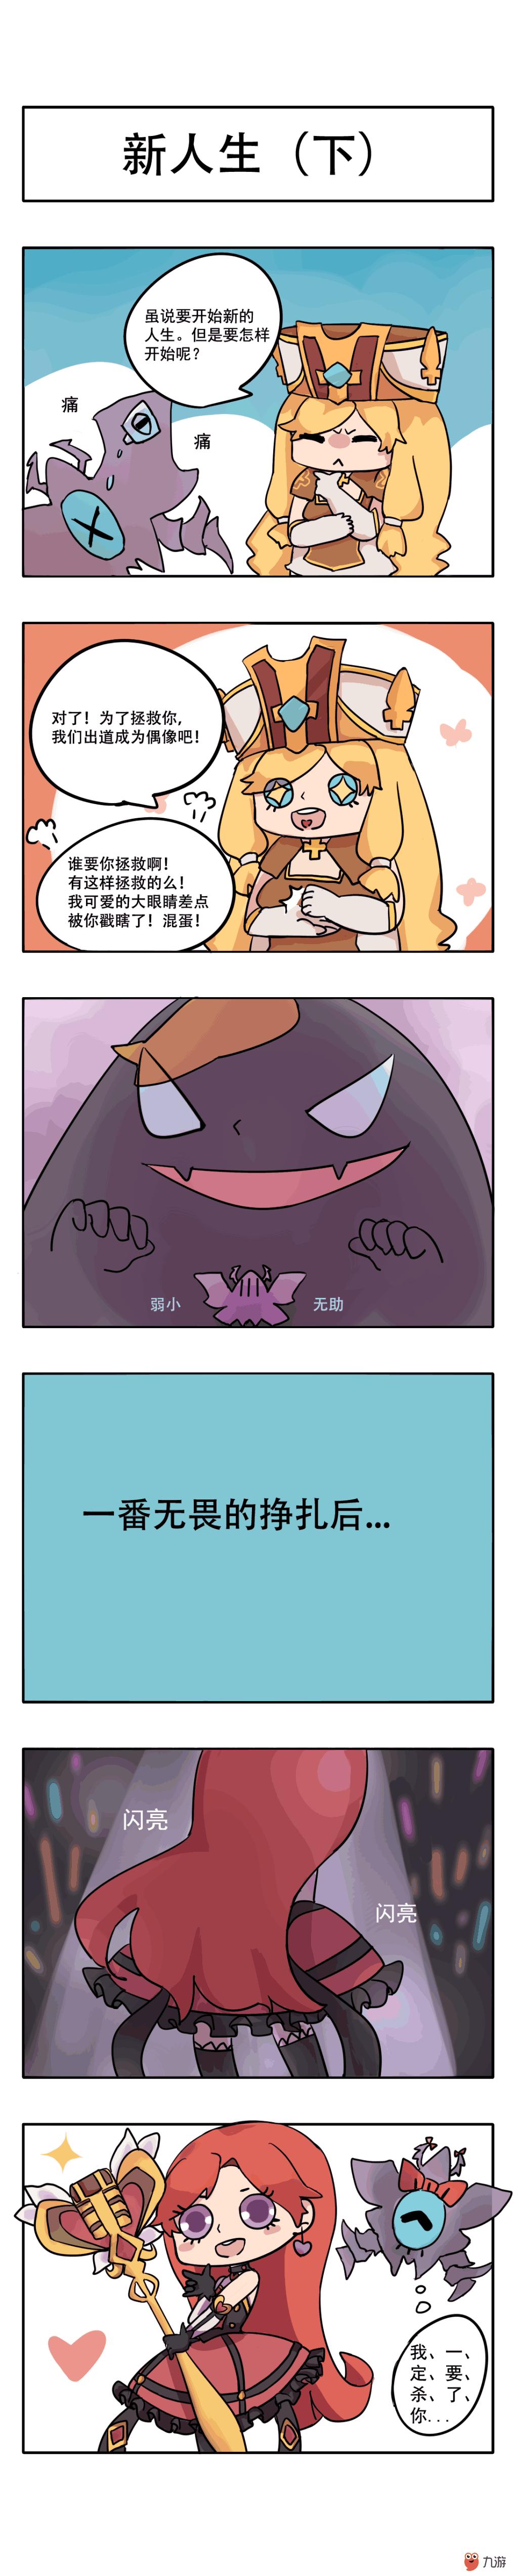 001新人生s下ss简中.png